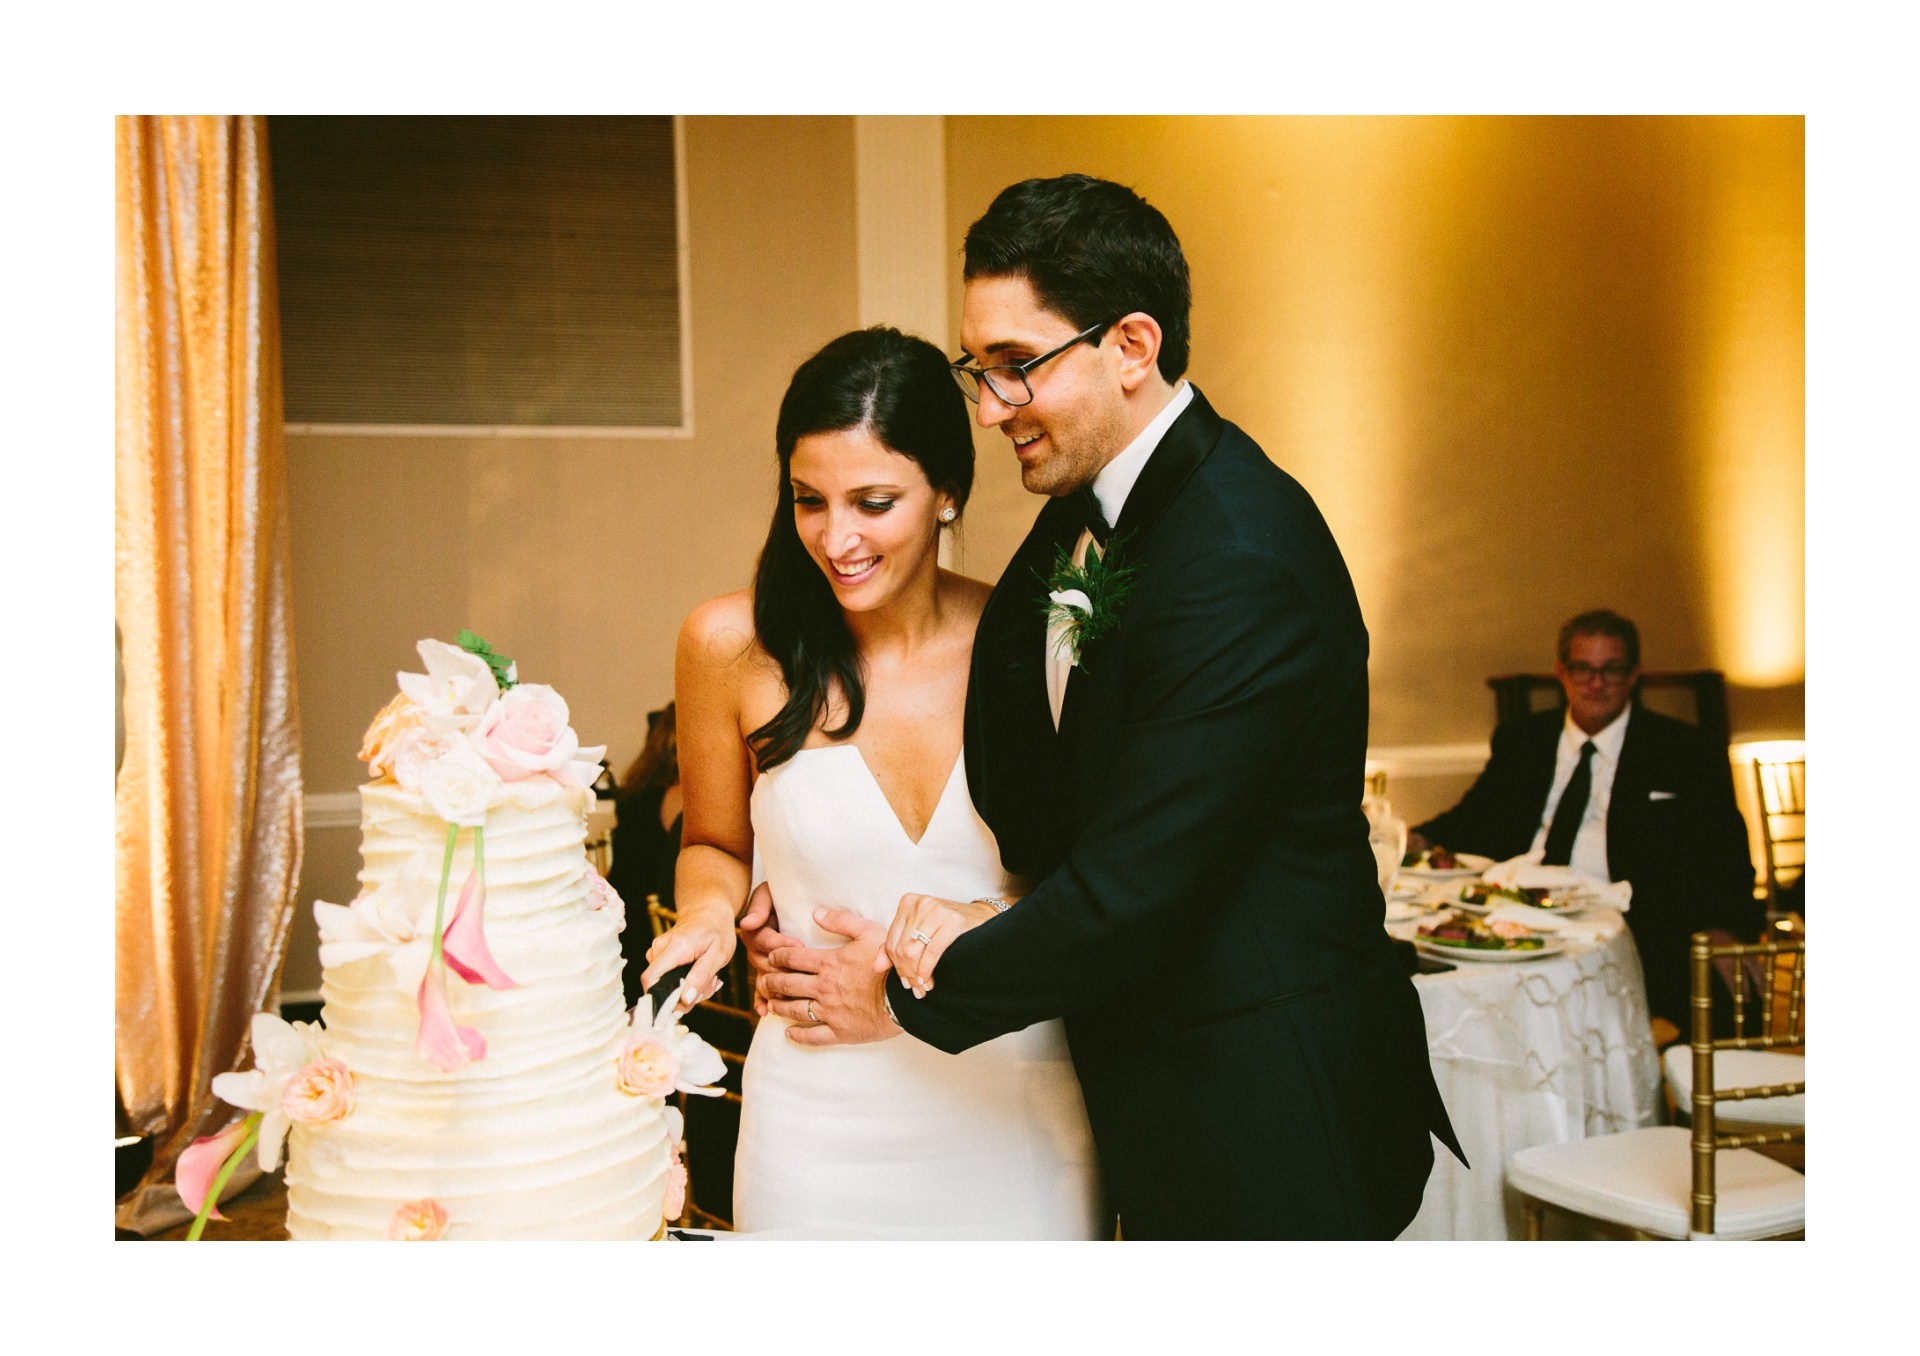 Beechmont Country Club Wedding Photographer in Beachwood 3 11.jpg